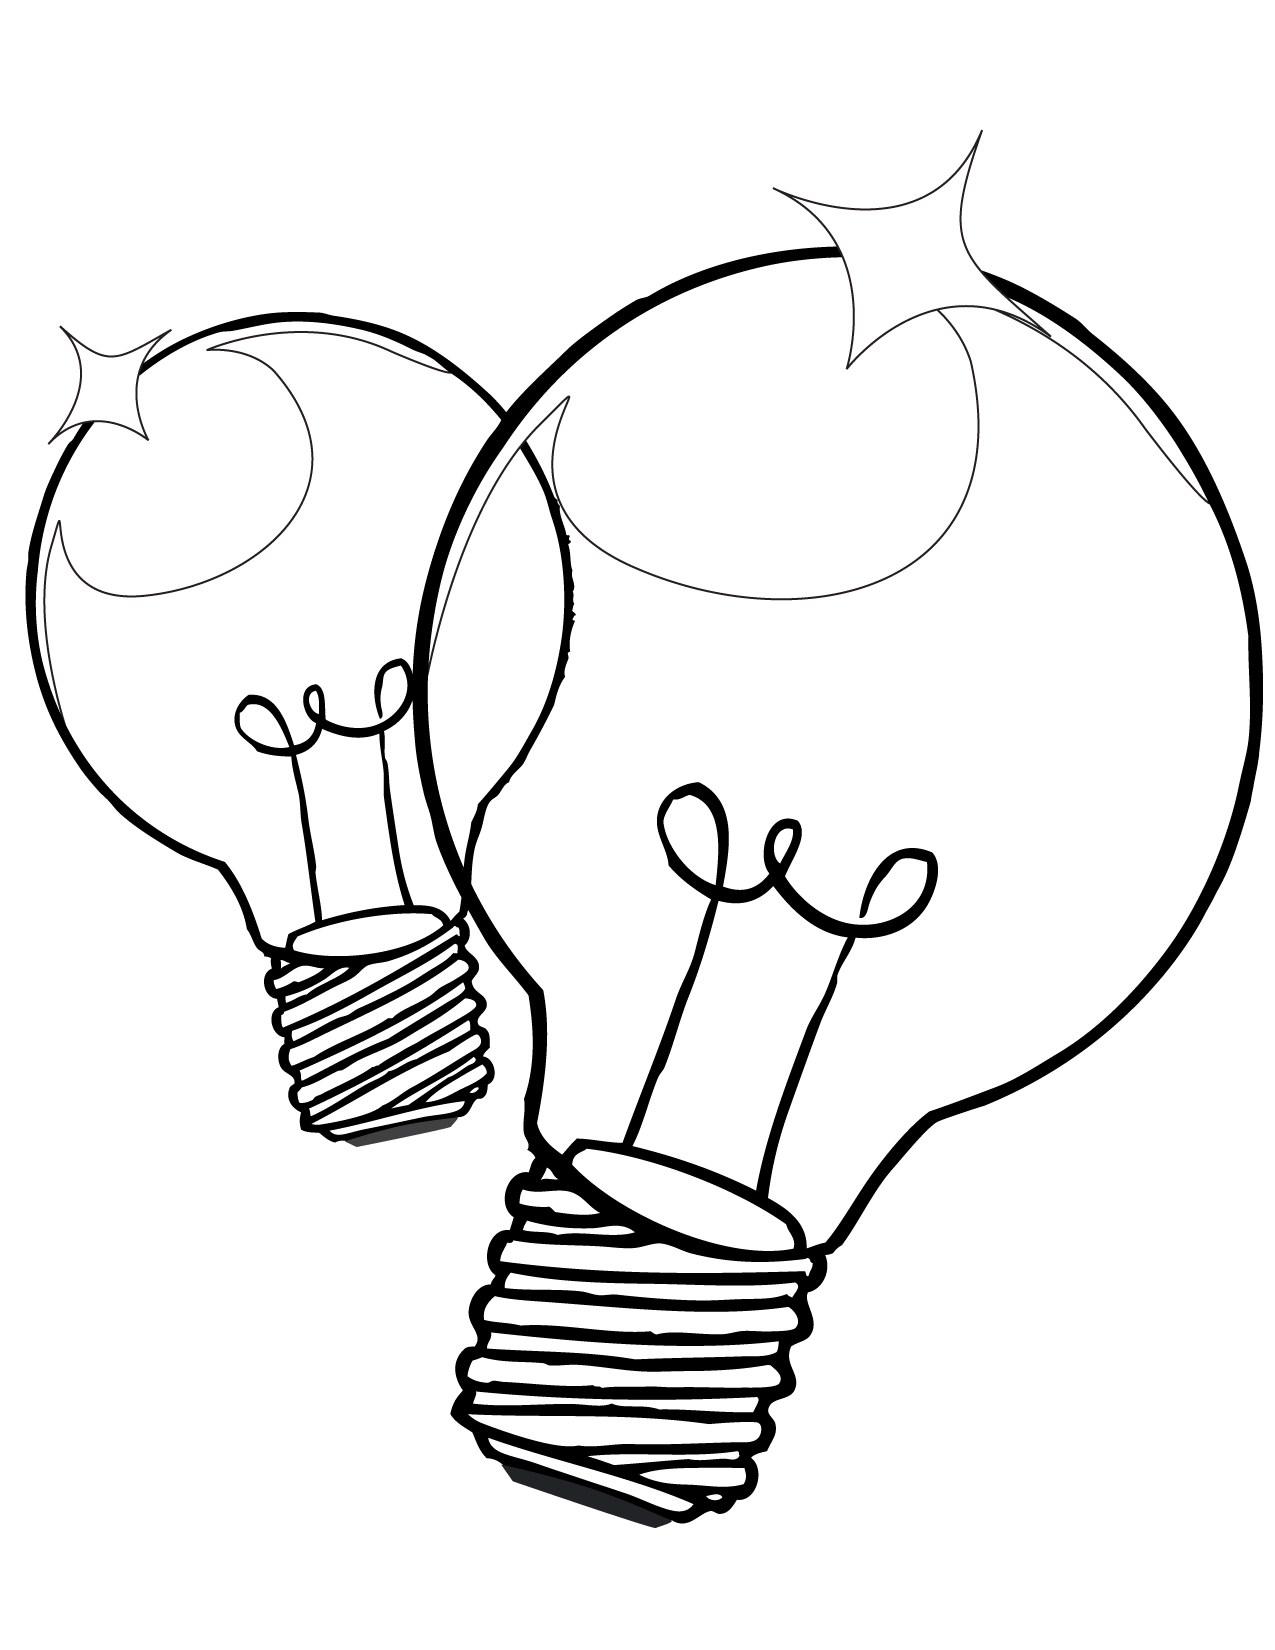 Thomas Edison Light Bulb Drawing At Getdrawings